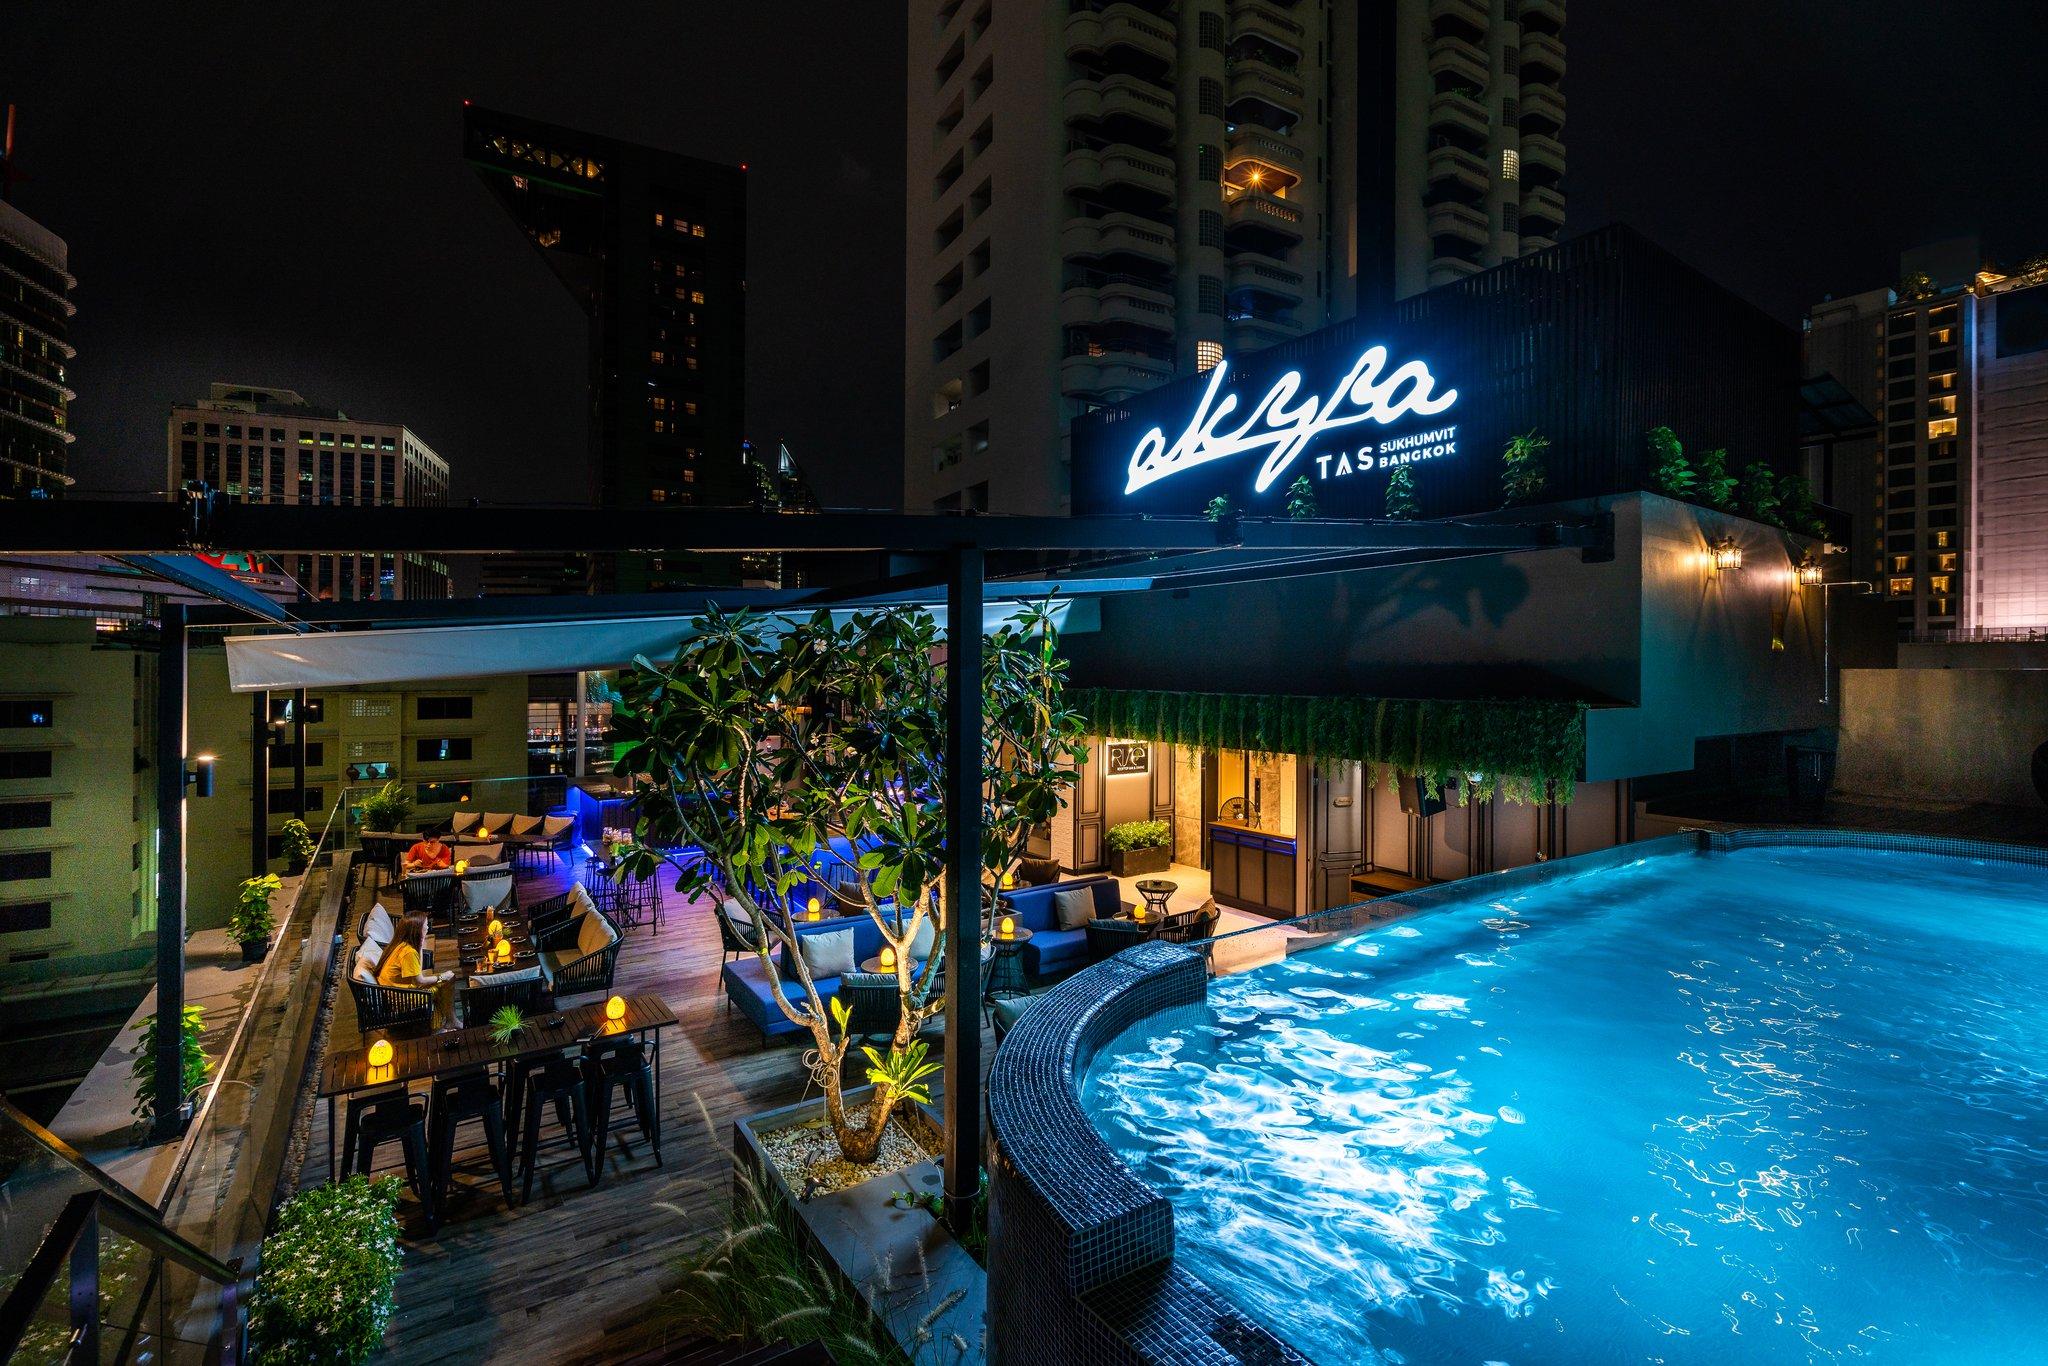 akyra_sukhumvit_rise_bar_pool_night_rooftop_S.jpg